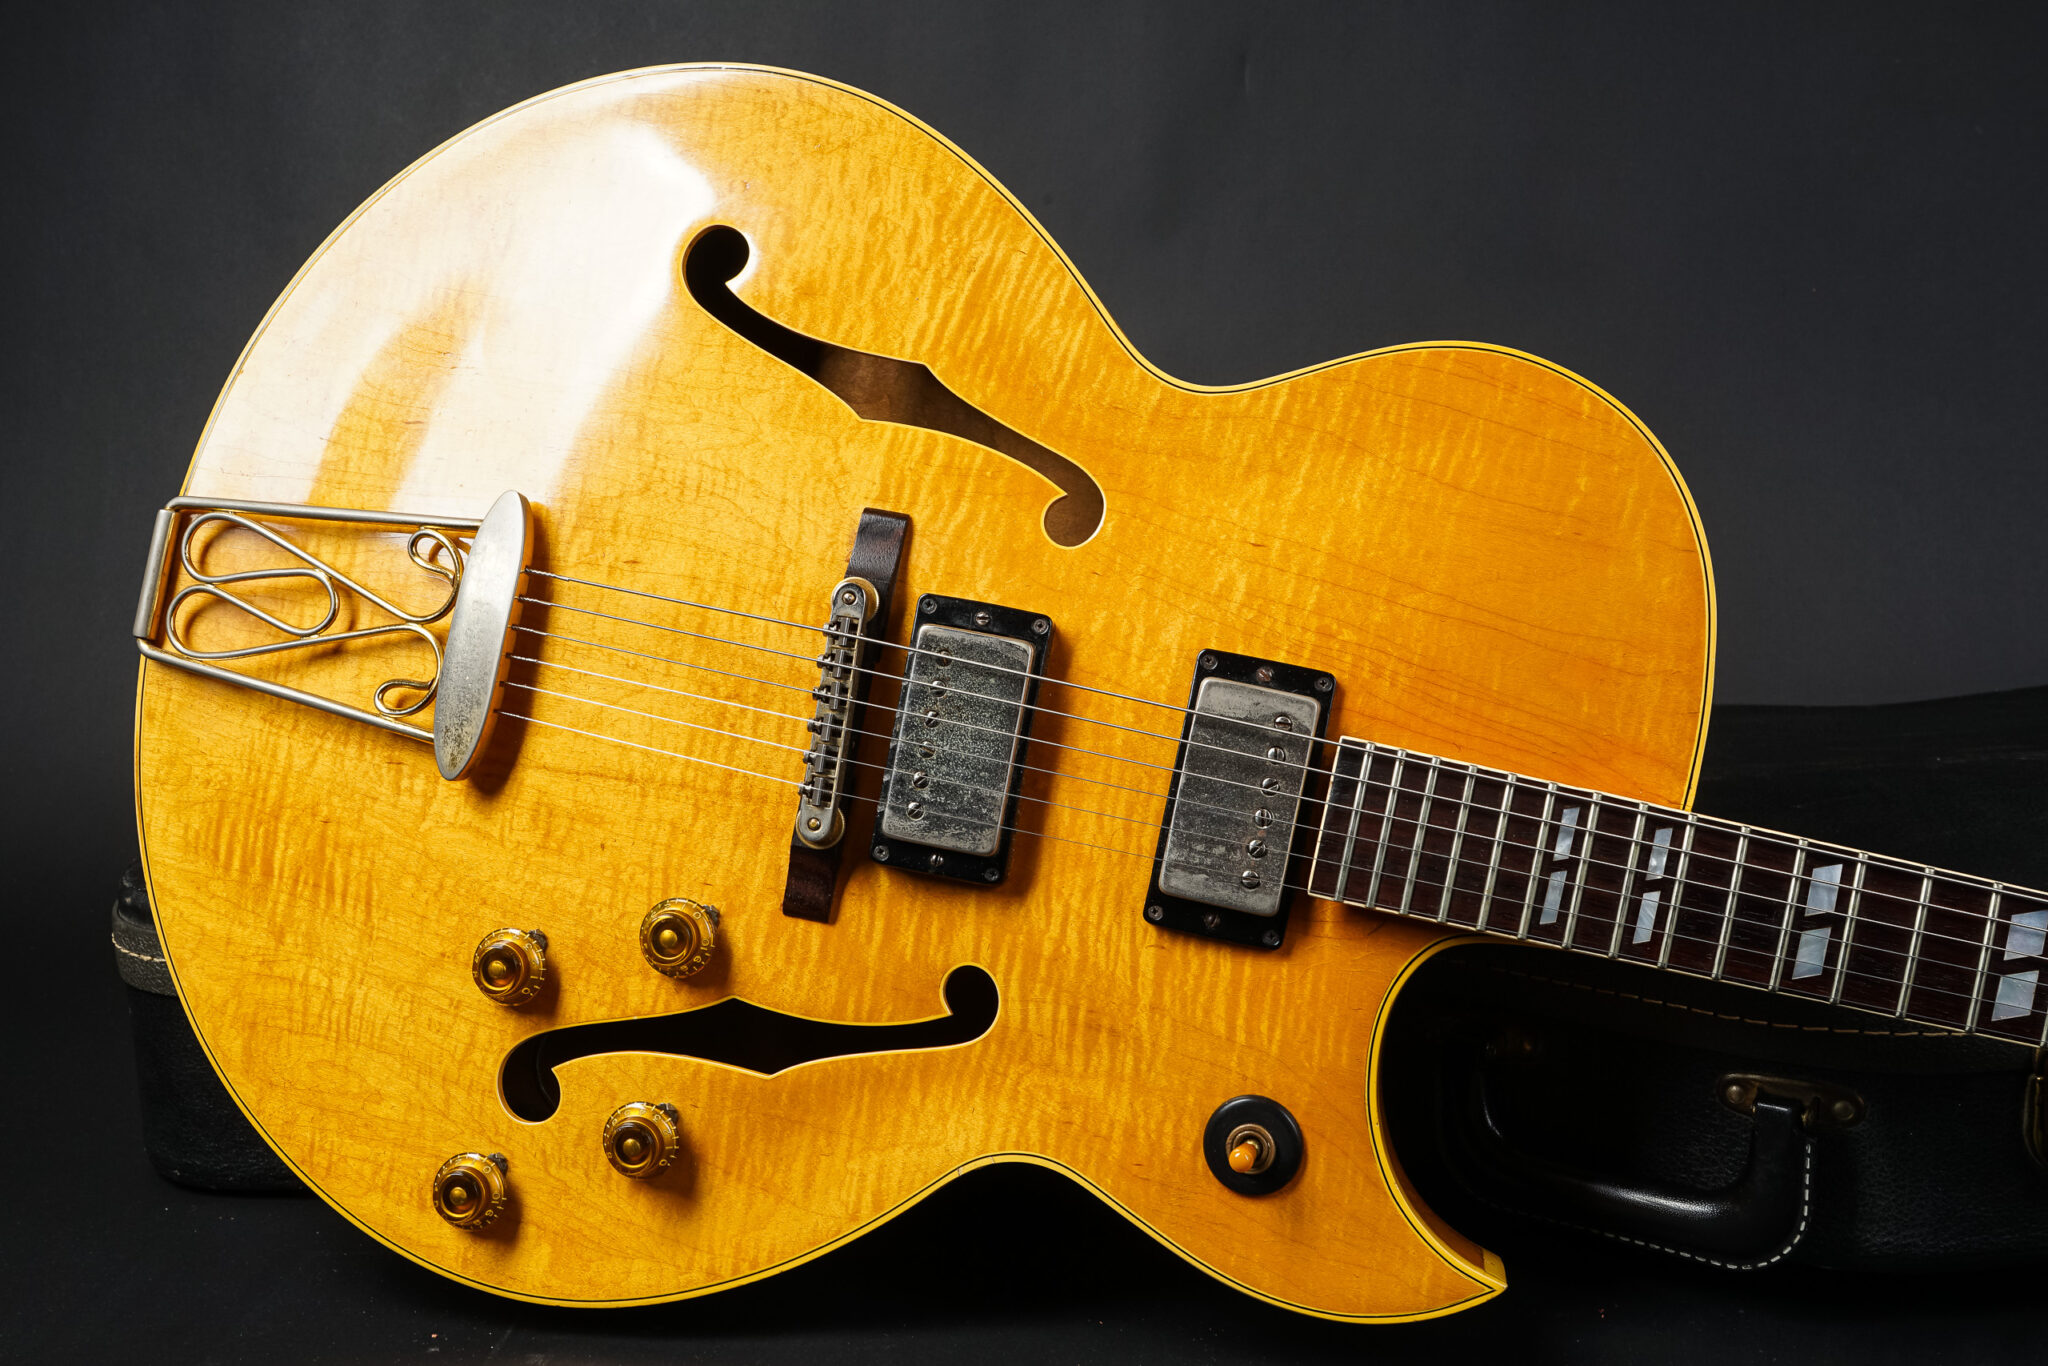 https://guitarpoint.de/app/uploads/products/1960-gibson-es-350t-natural/1960-Gibson-ES-350-Natural-8-2048x1366.jpg